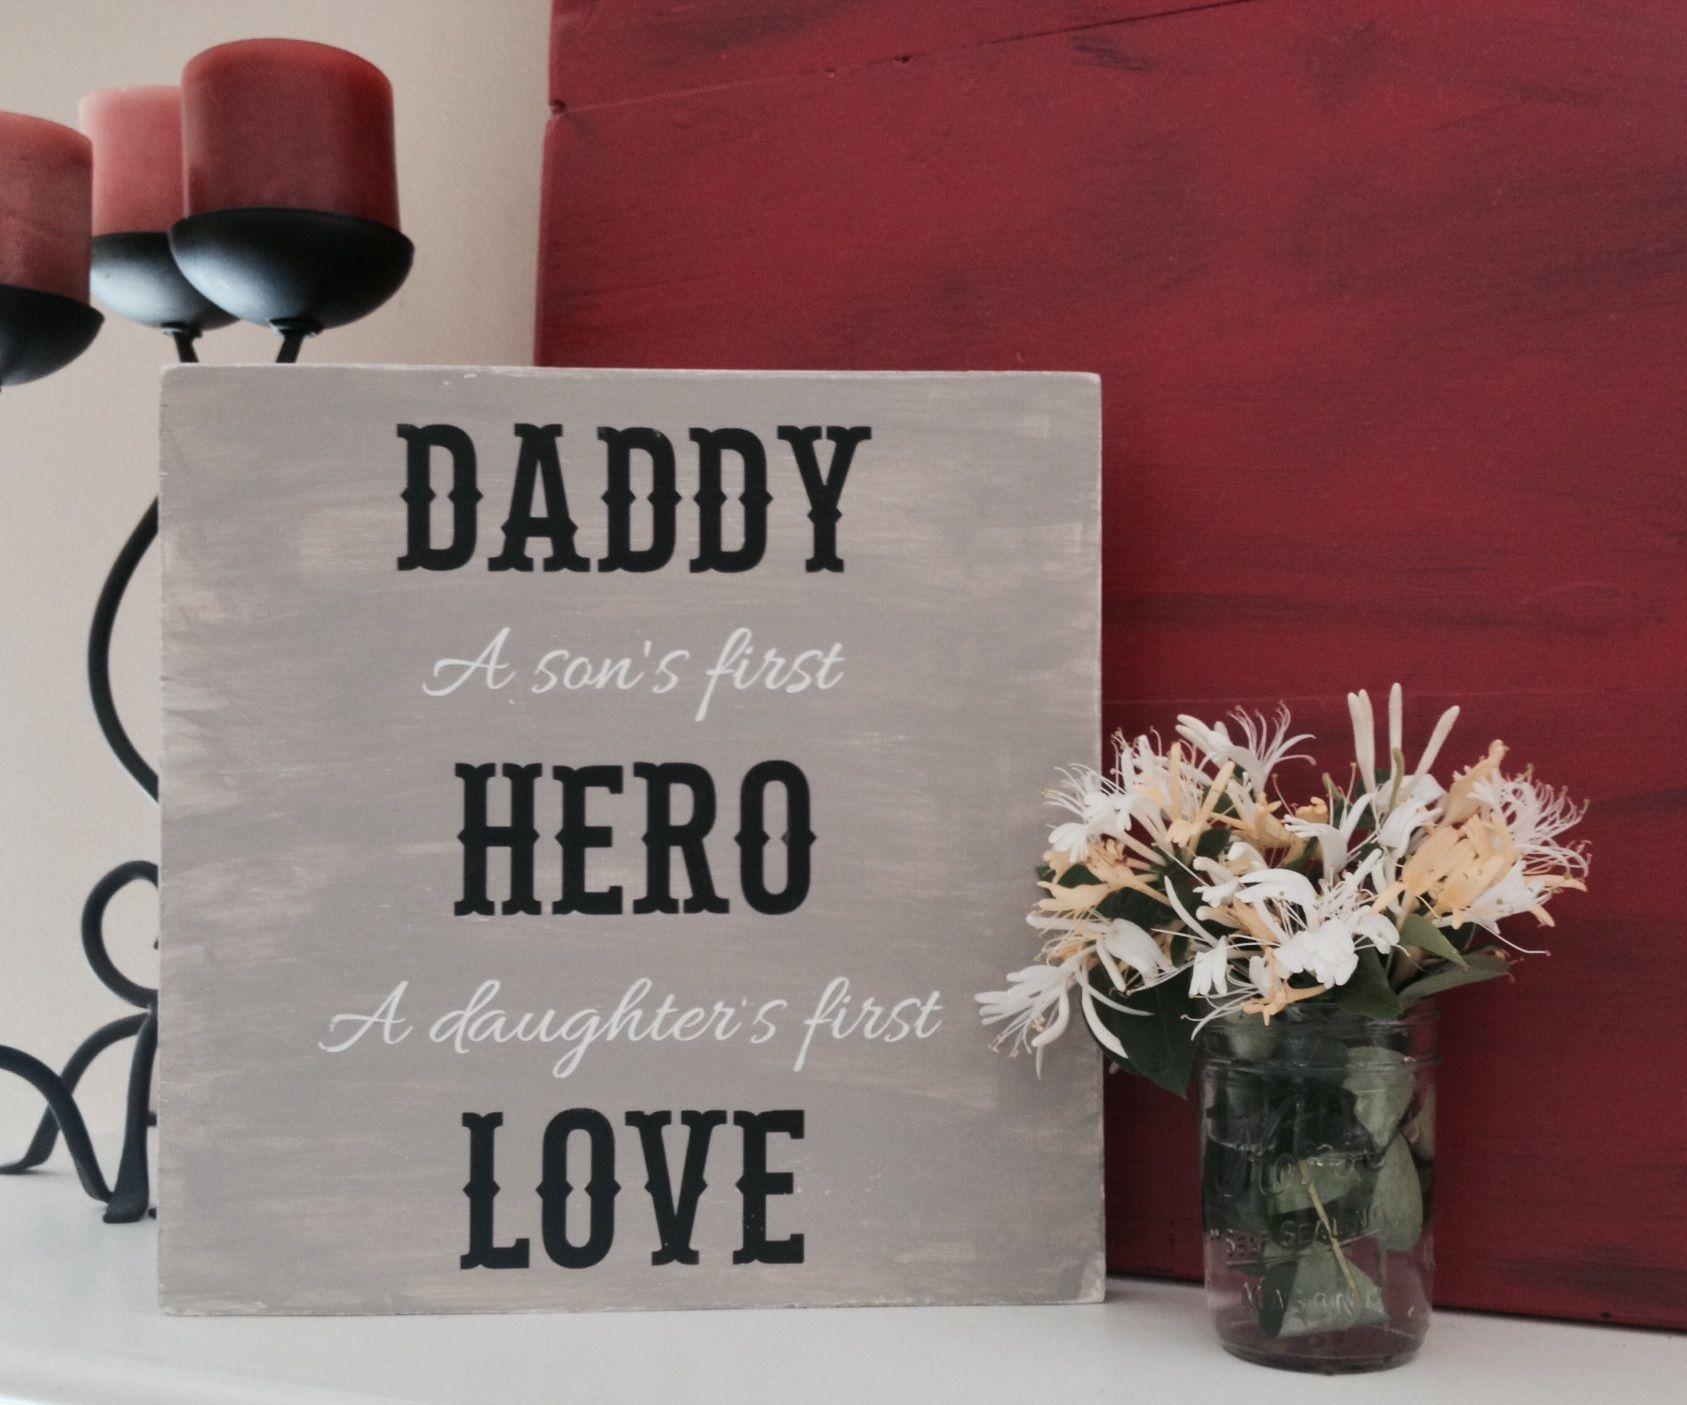 Daddy love bare